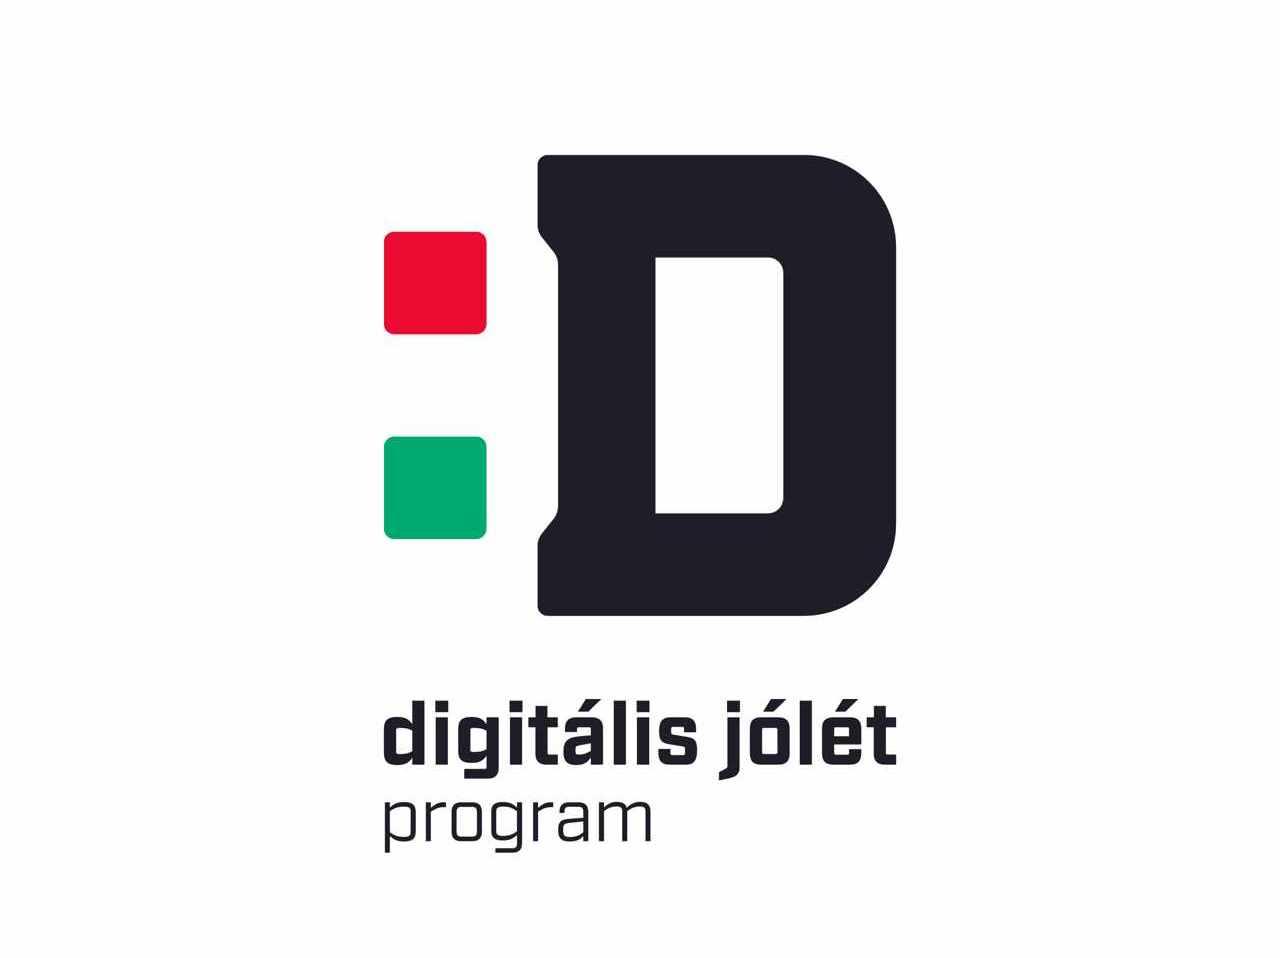 digitalis-jolet-program-logo-px